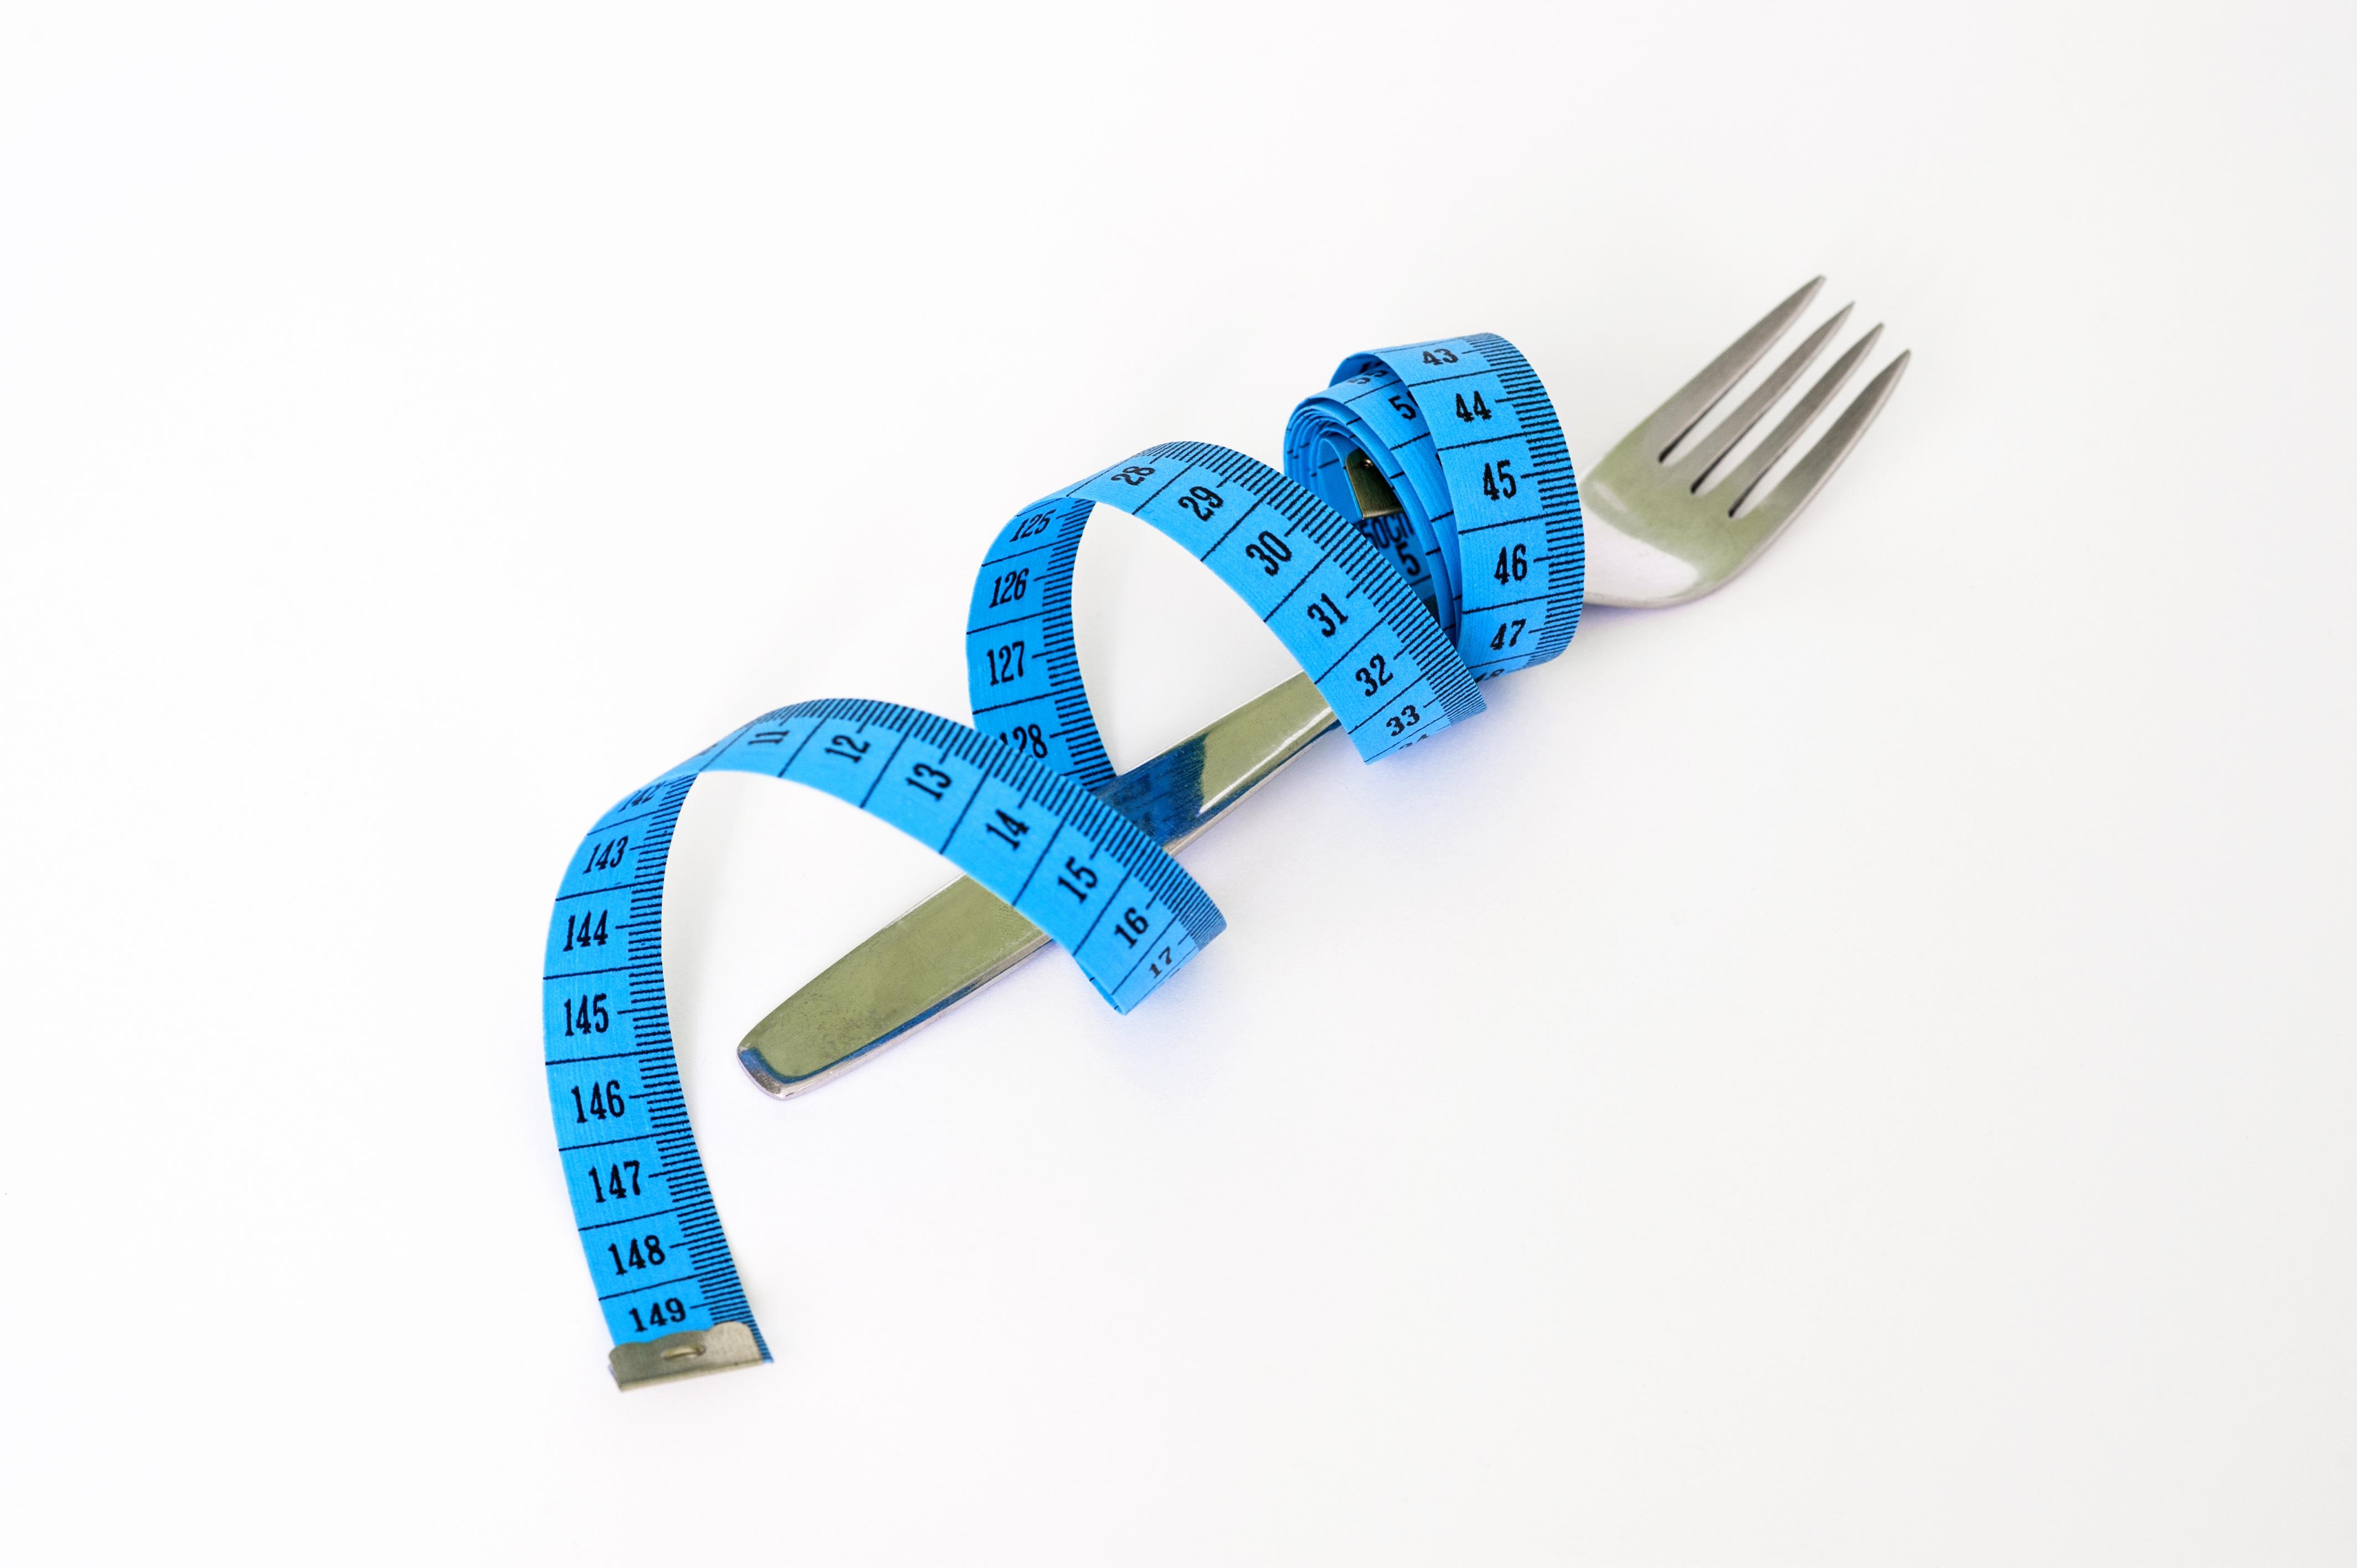 tape-fork-diet-health-53416